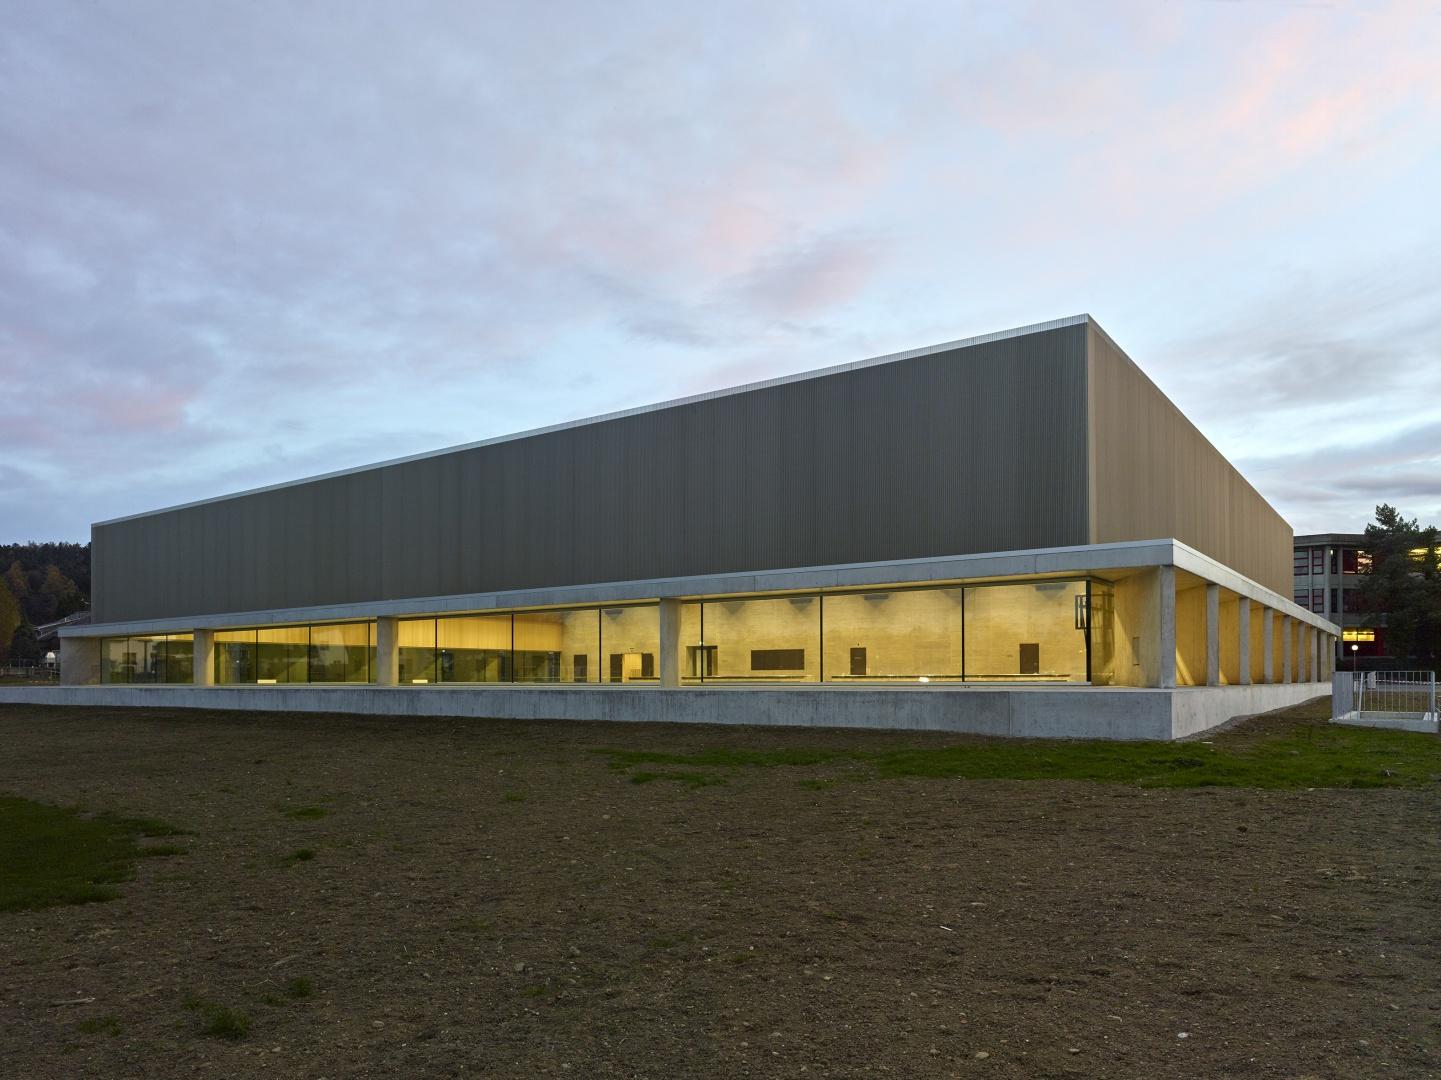 Neubau sporthalle aadorf schweizer baudokumentation - Graf architekten ...